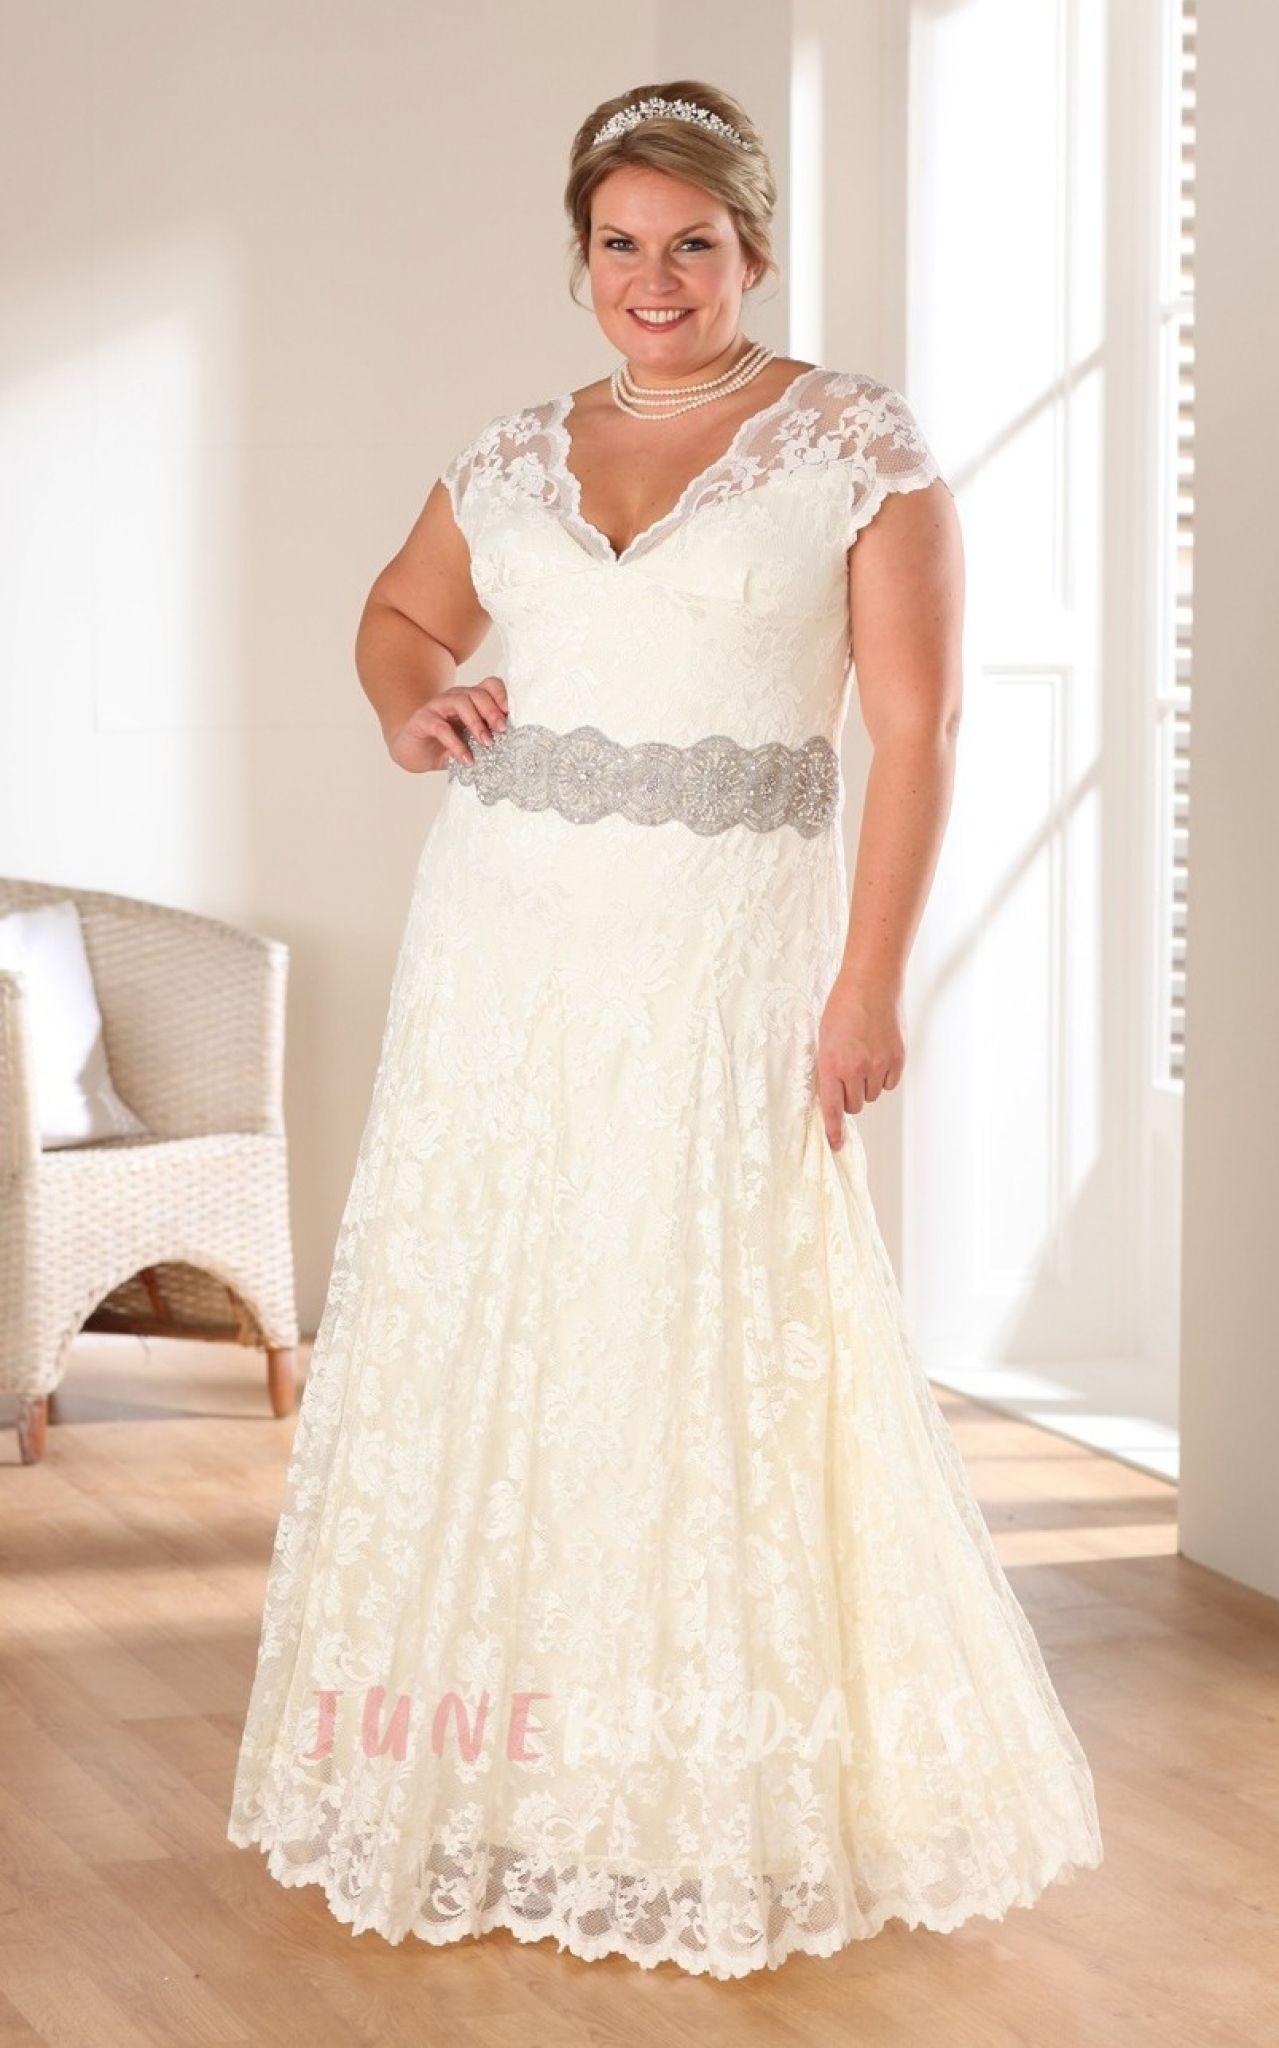 Plus size casual wedding dress  casual wedding dresses for plus size  wedding dresses for guests